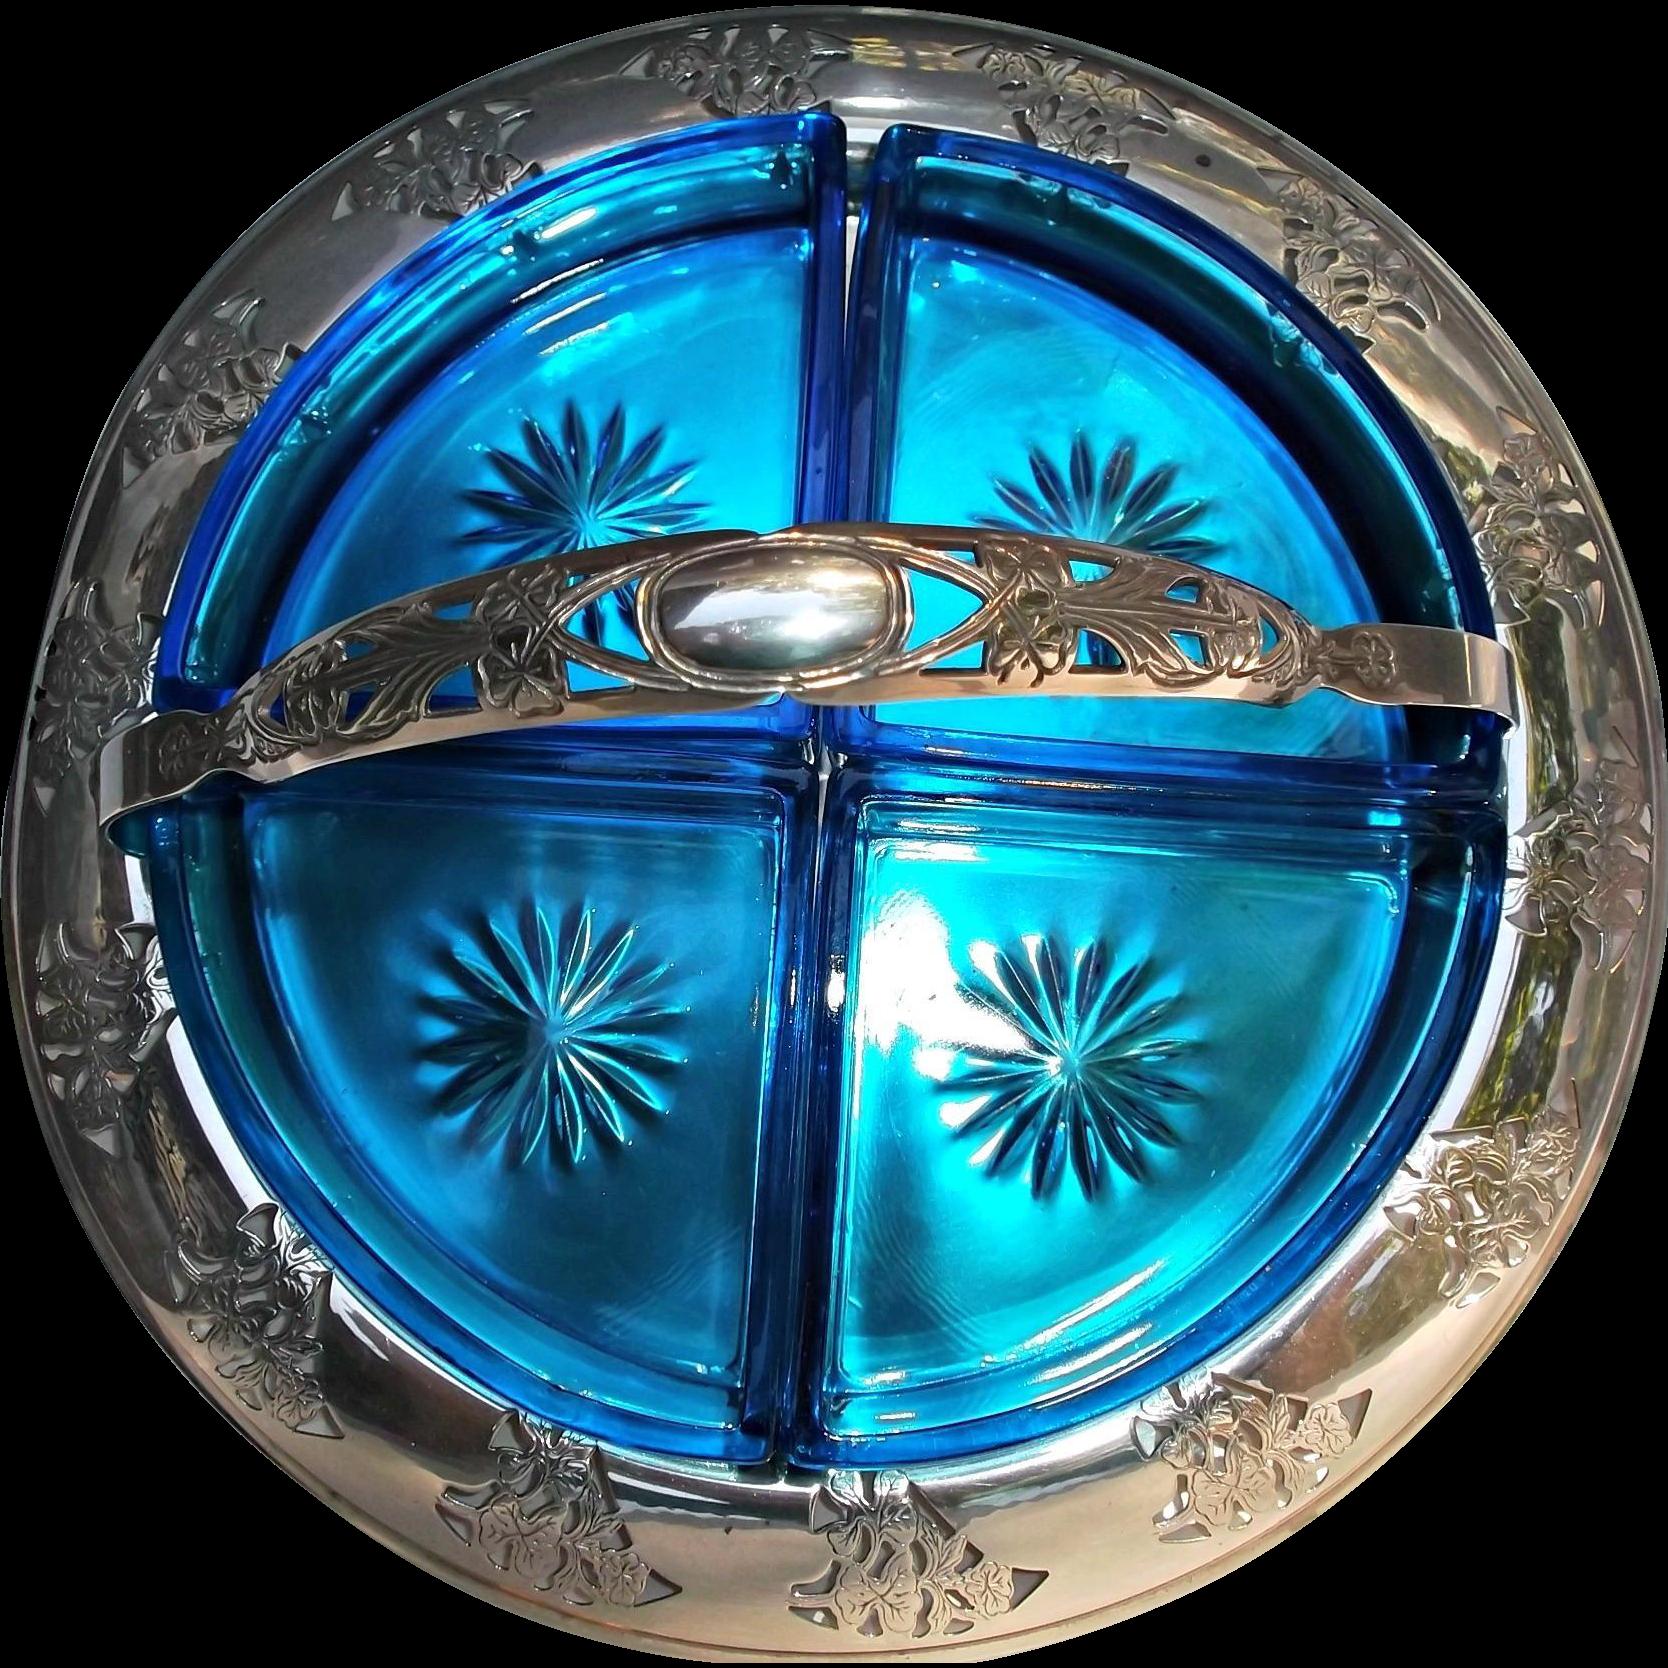 Farberware Chrome Divided Blue Glass Vintage Condiment Tidbit Tray